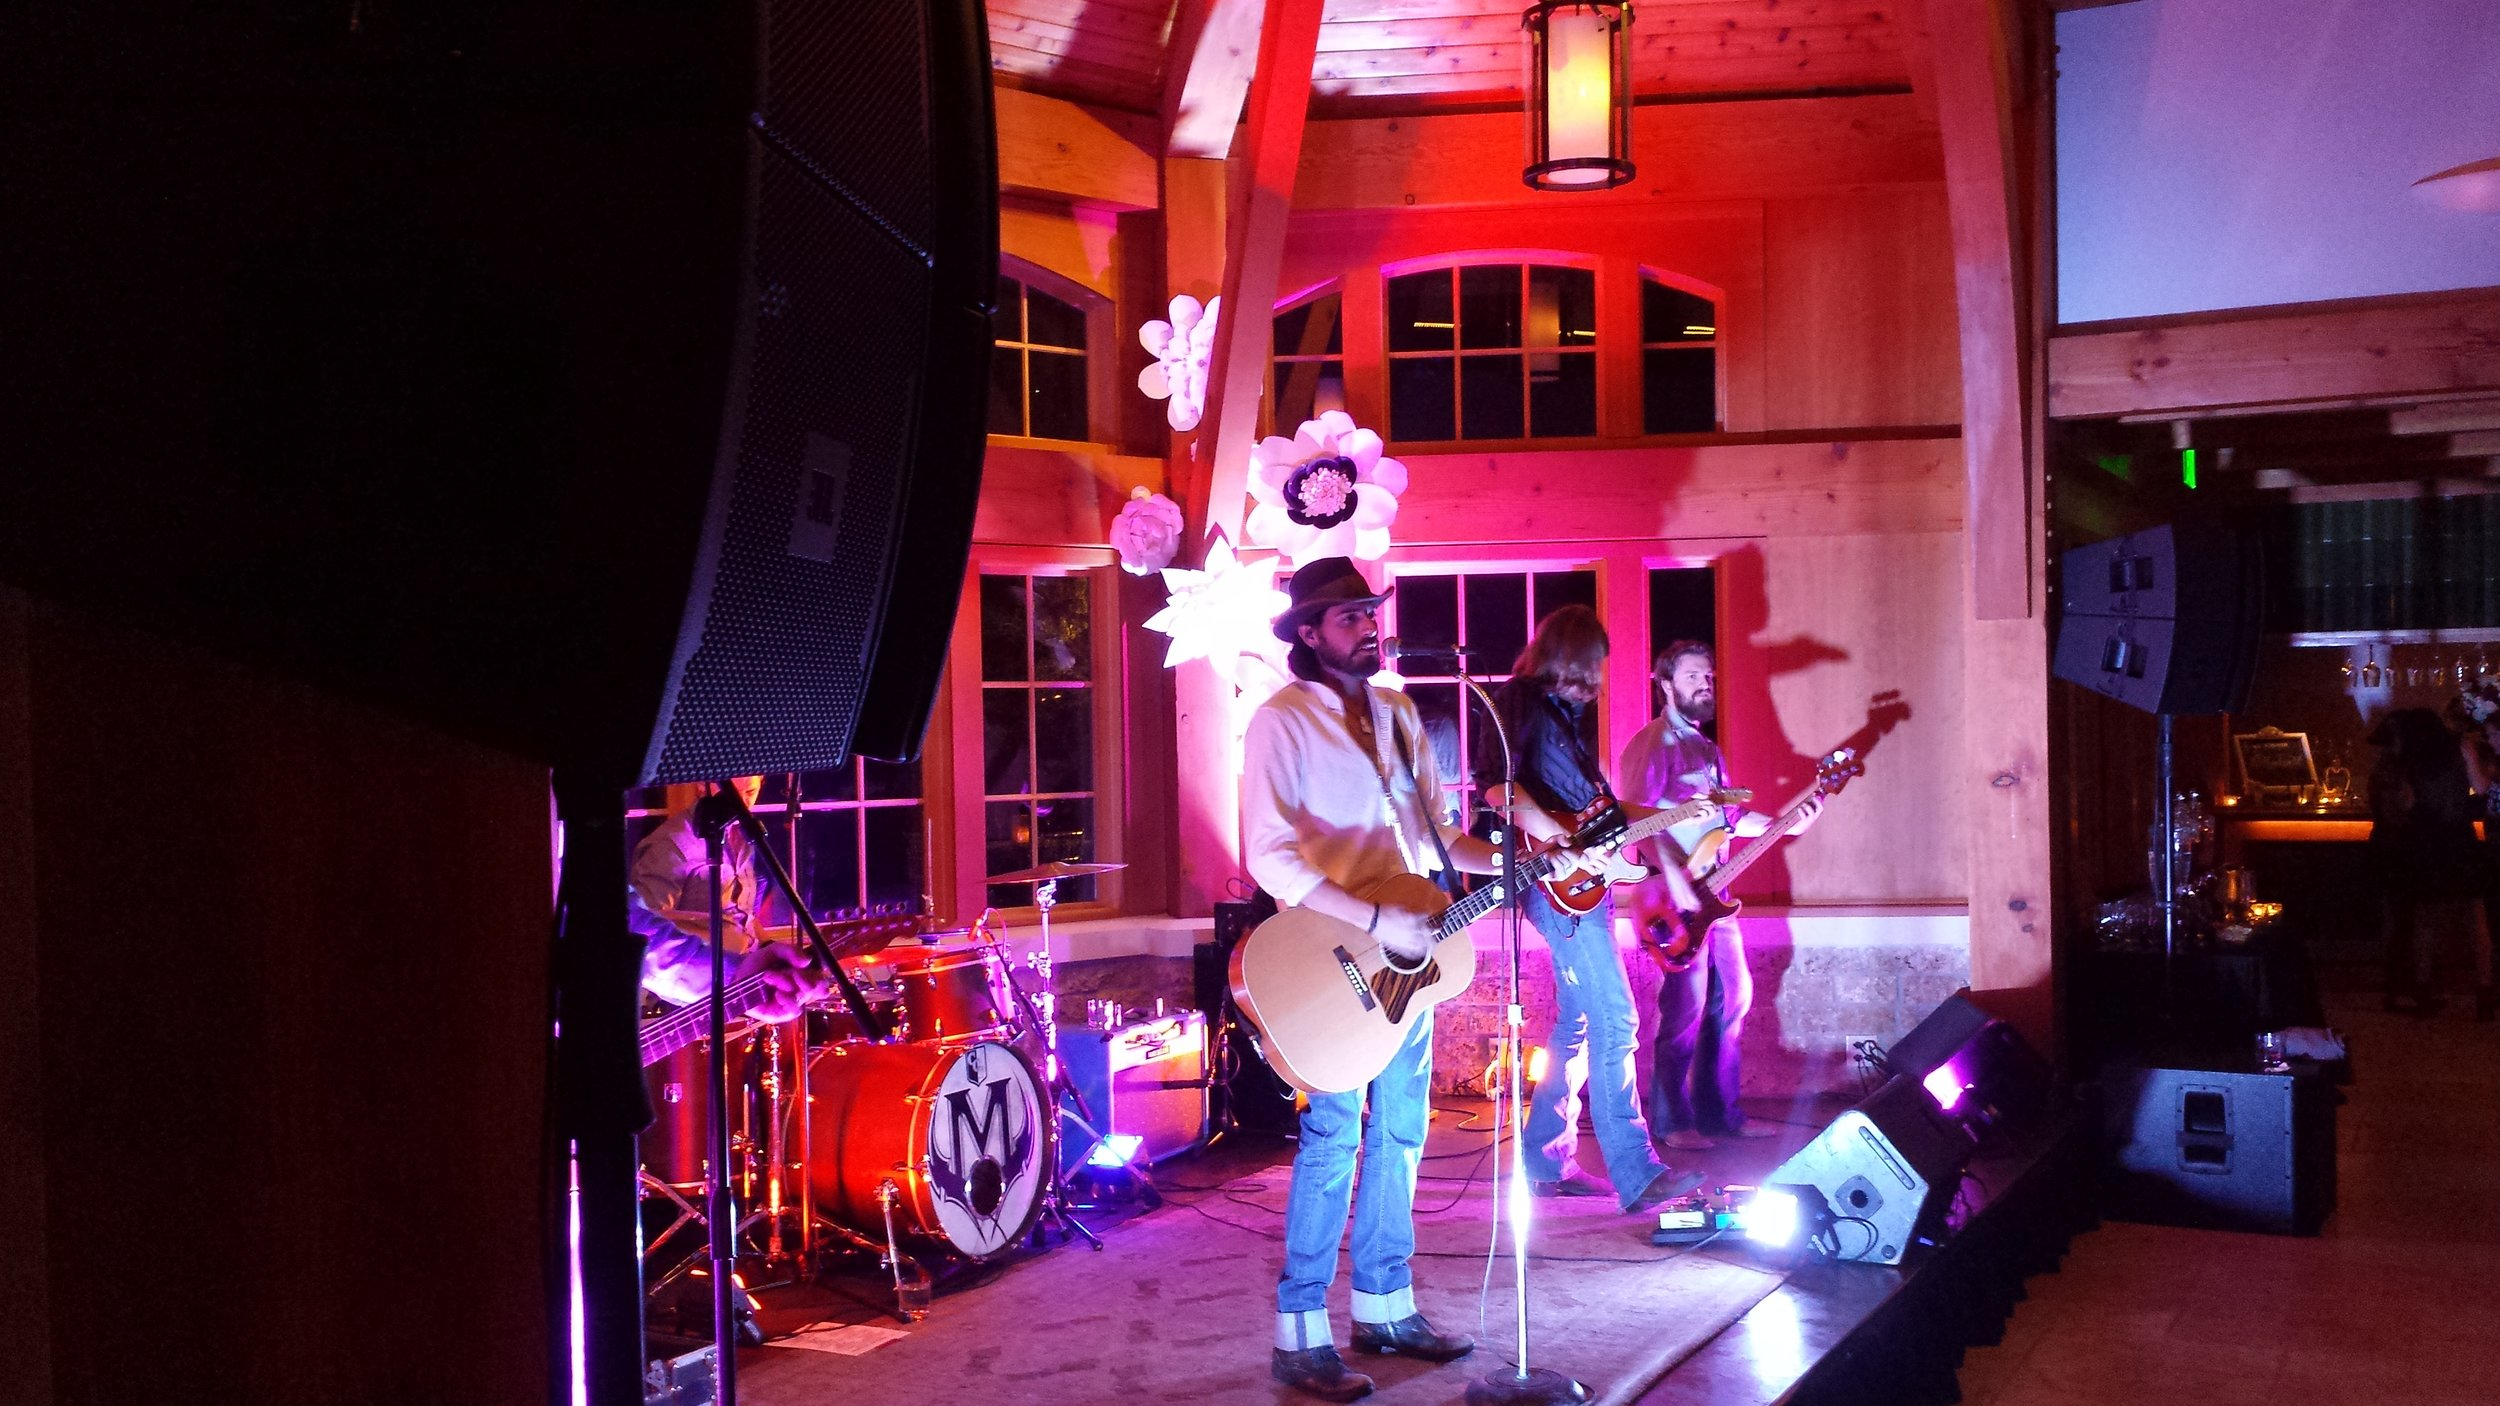 11-9-14 Sound & Lights for Wedding Band (2).jpg